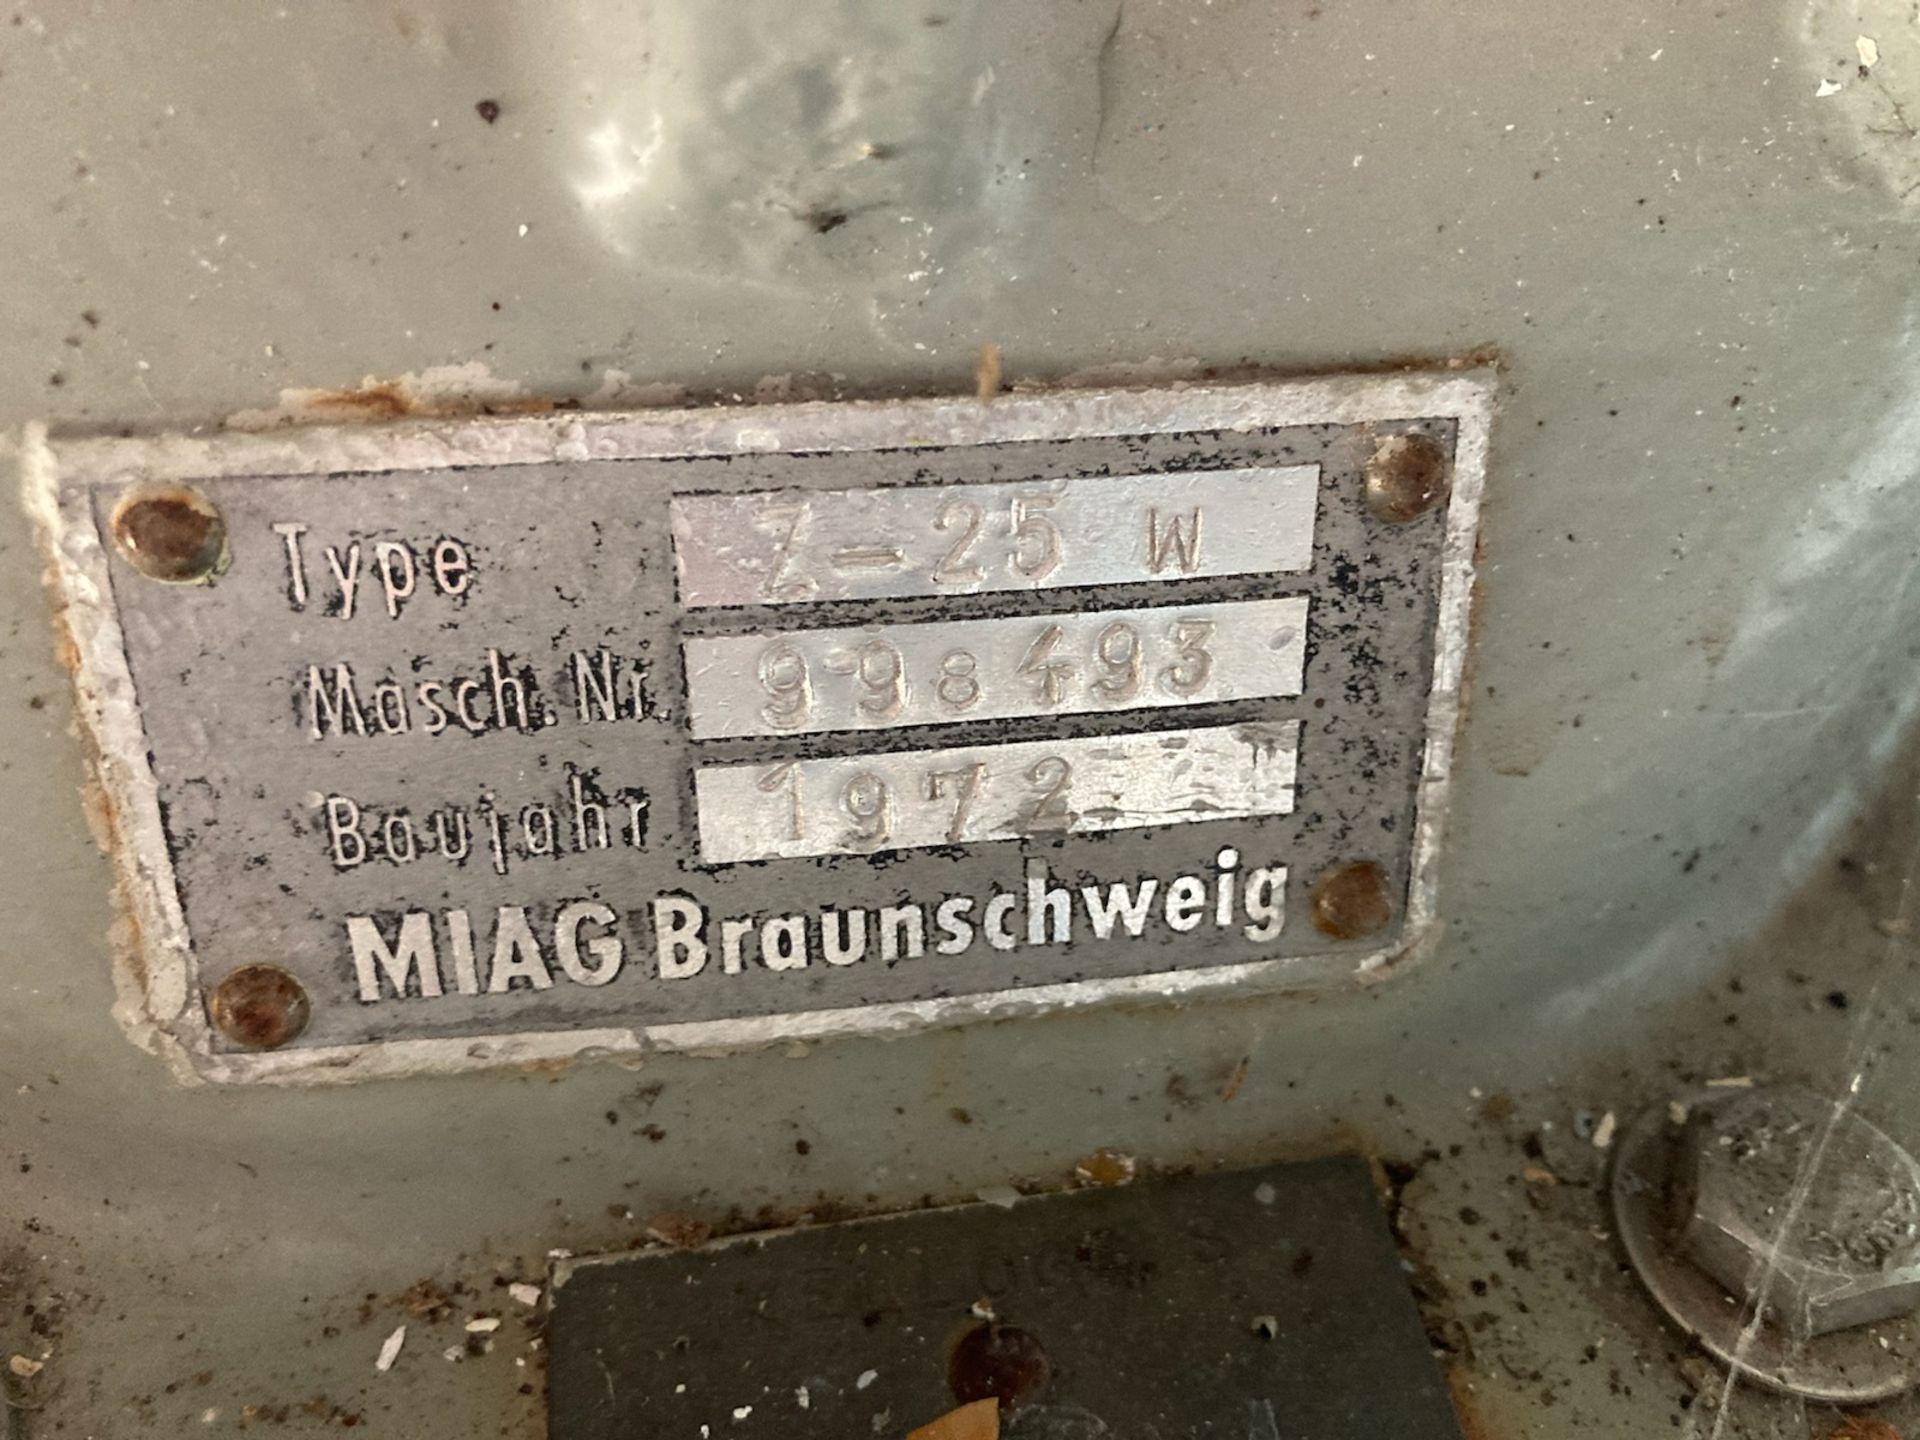 MIAG Braunschweig Rotary Valve Type Z-25W S/N 998493 - Image 2 of 2